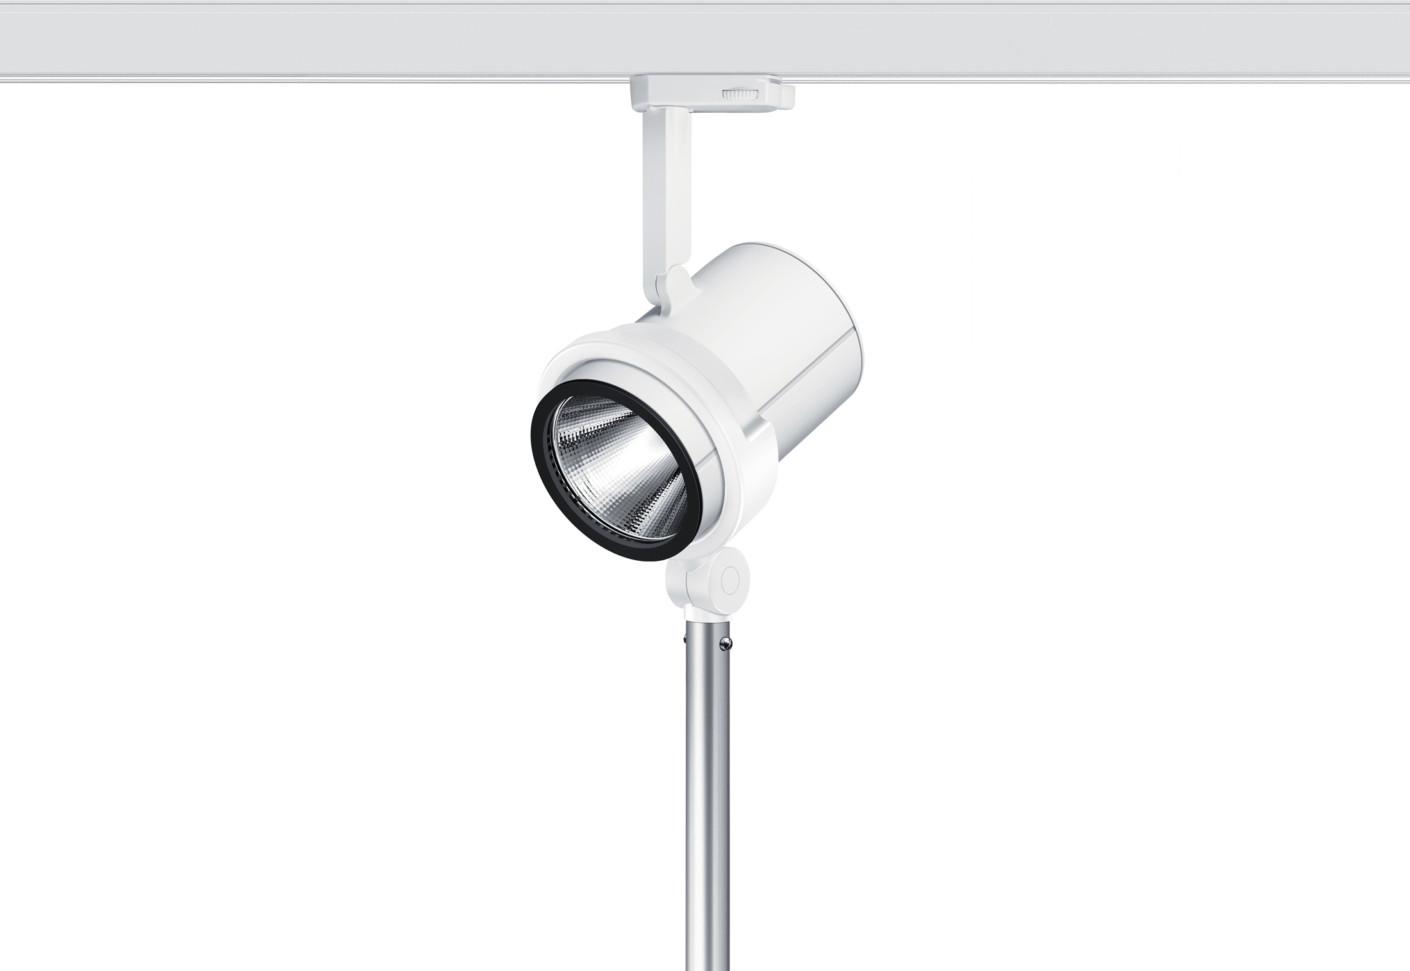 Onico light track system by Zumtobel